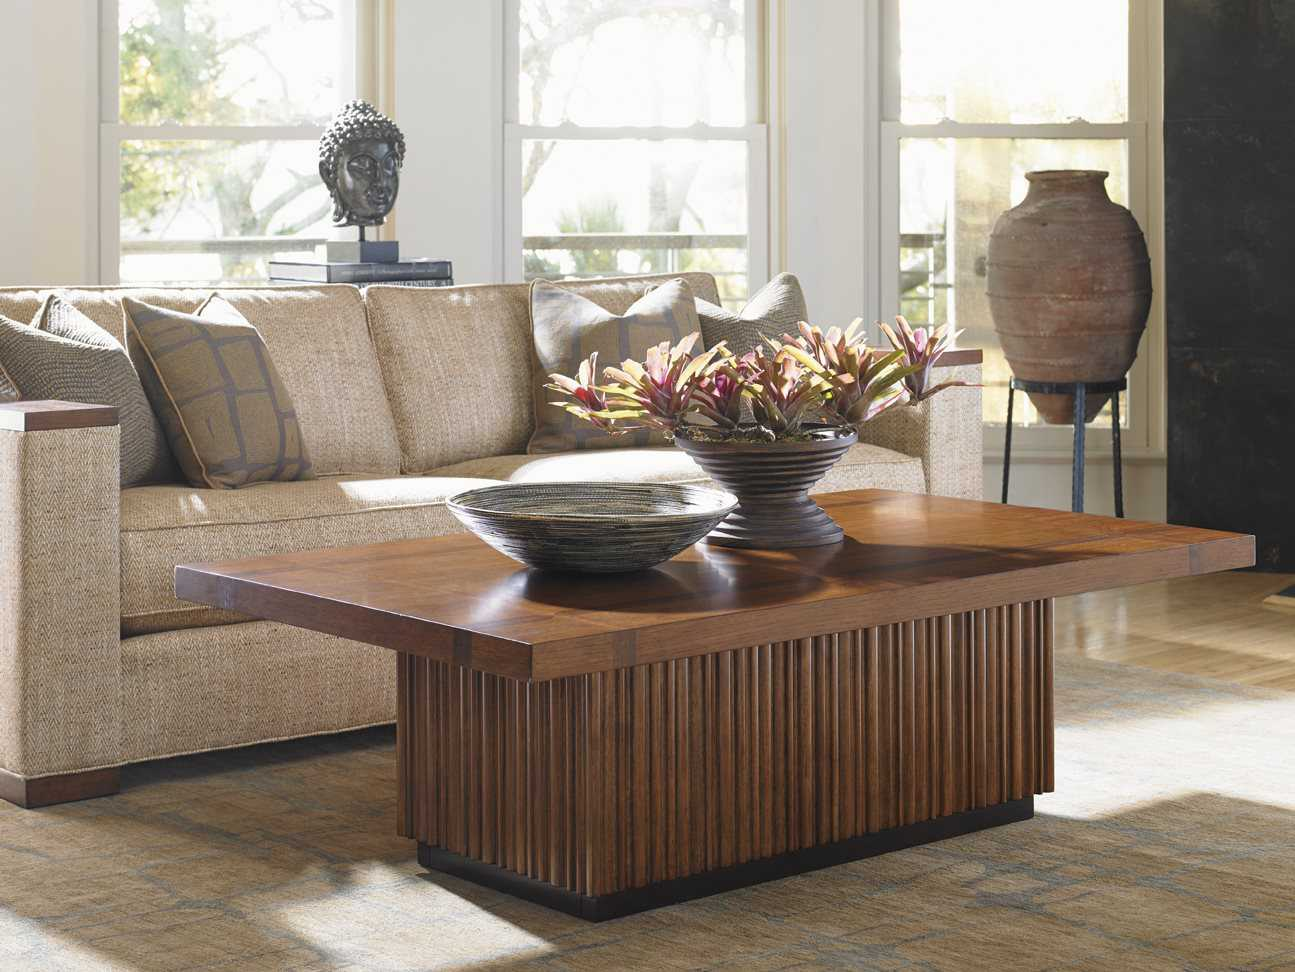 tommy bahama island fusion castaway sebana living room set to556945set. Black Bedroom Furniture Sets. Home Design Ideas